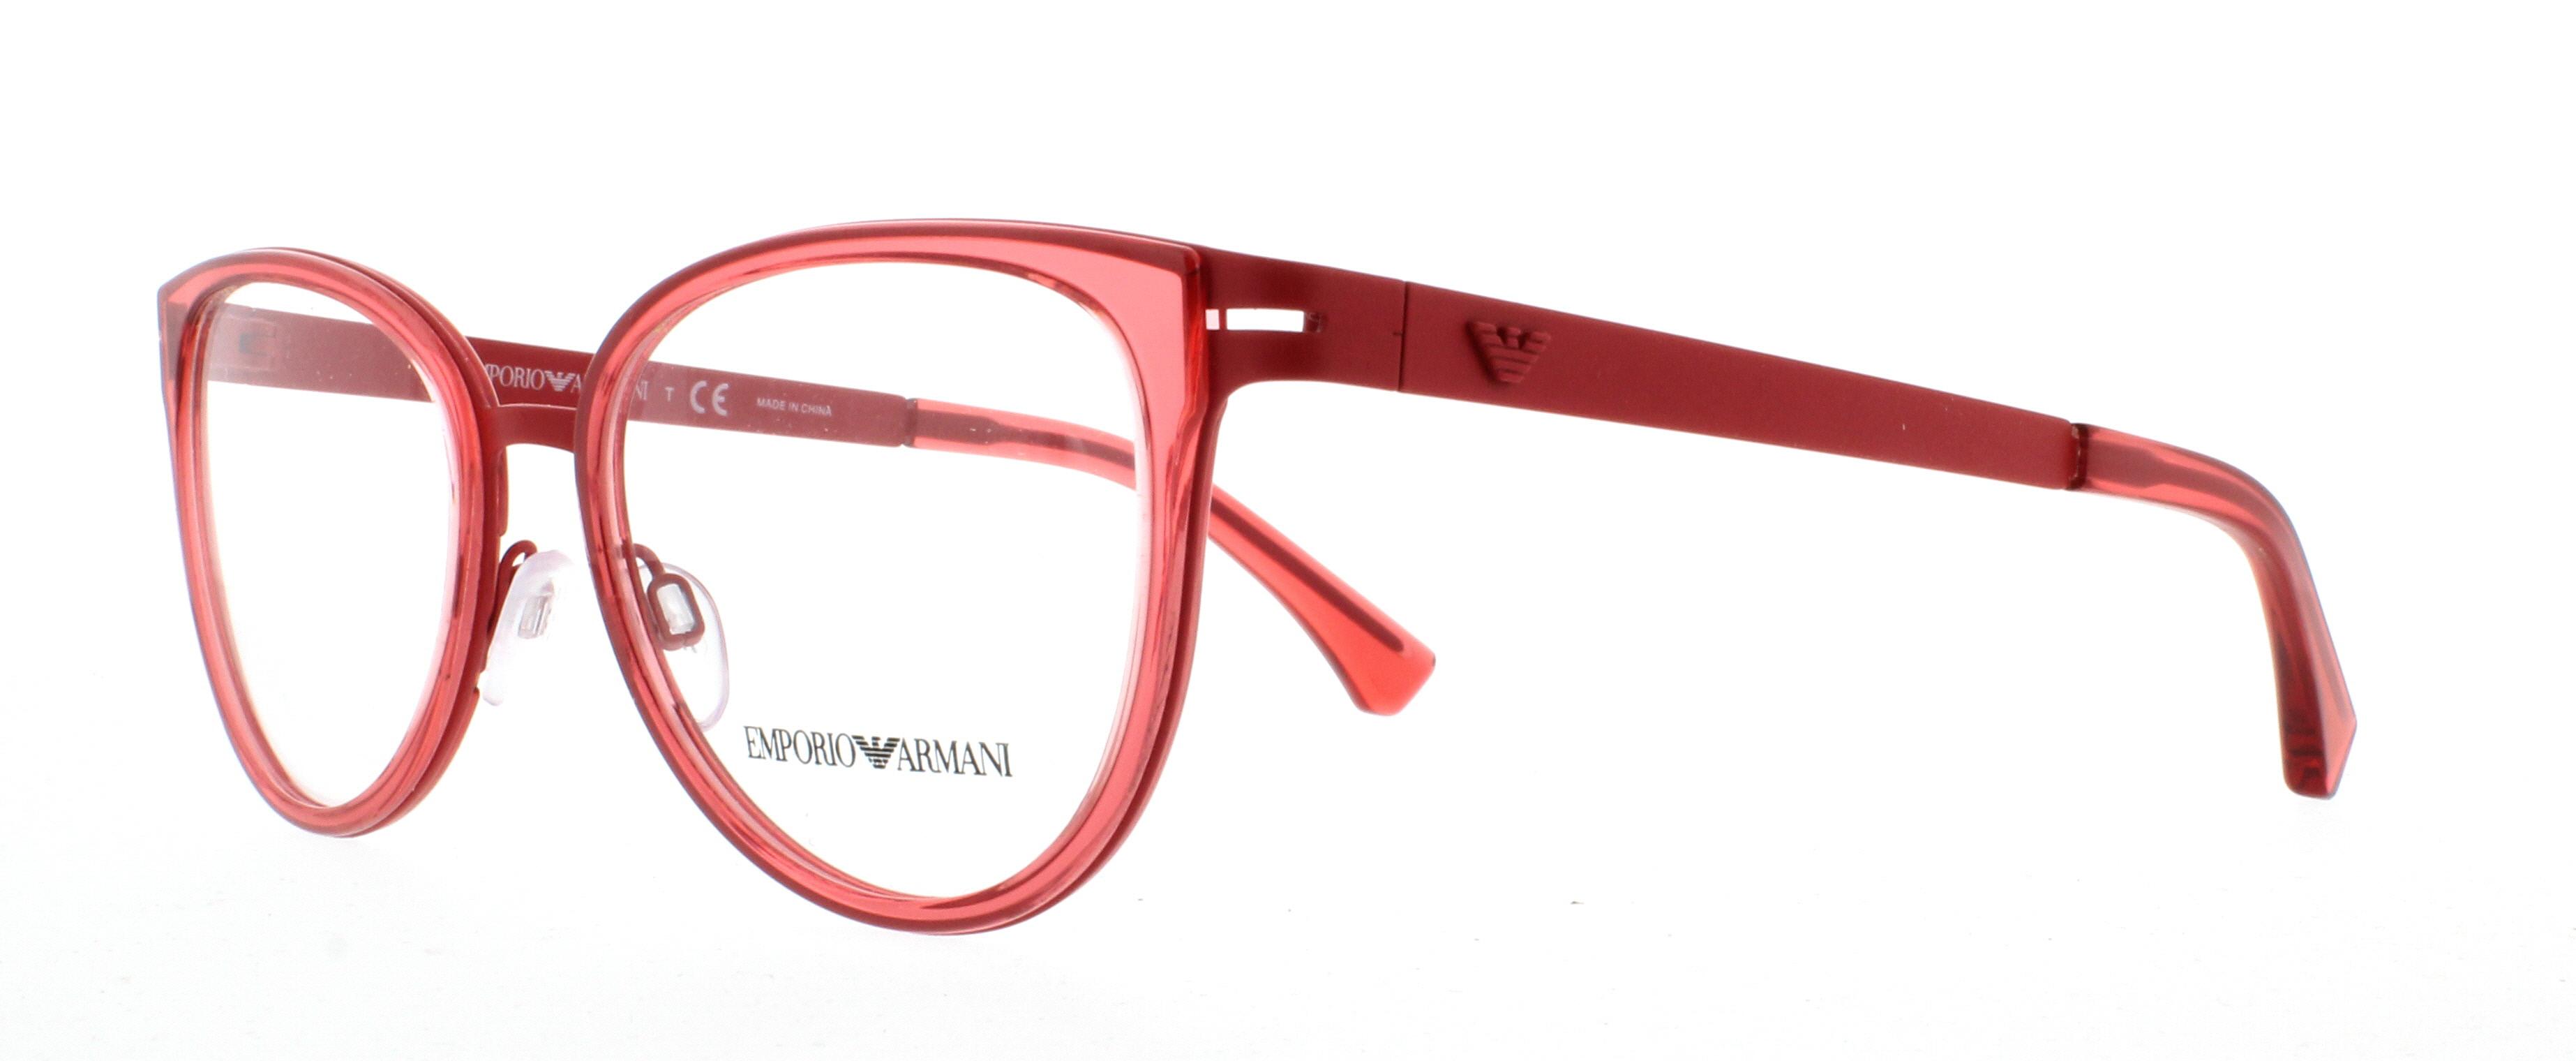 724c20f0aa Designer Frames Outlet. Emporio Armani EA1032